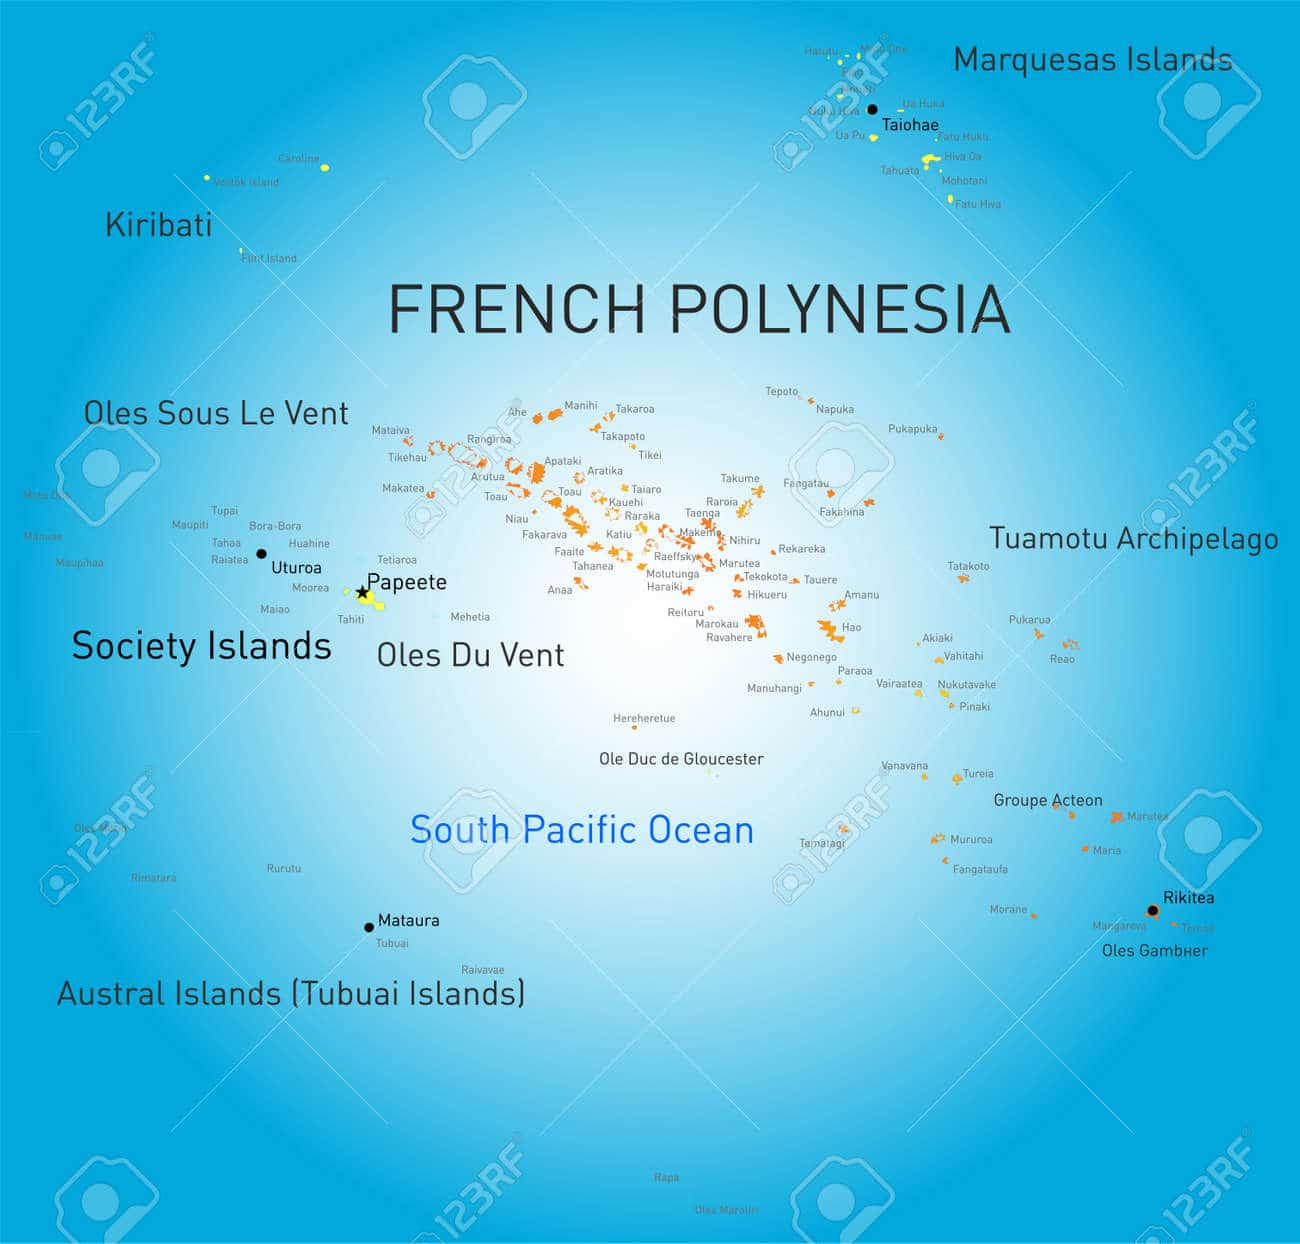 French Polynesia map to locate Tahiti